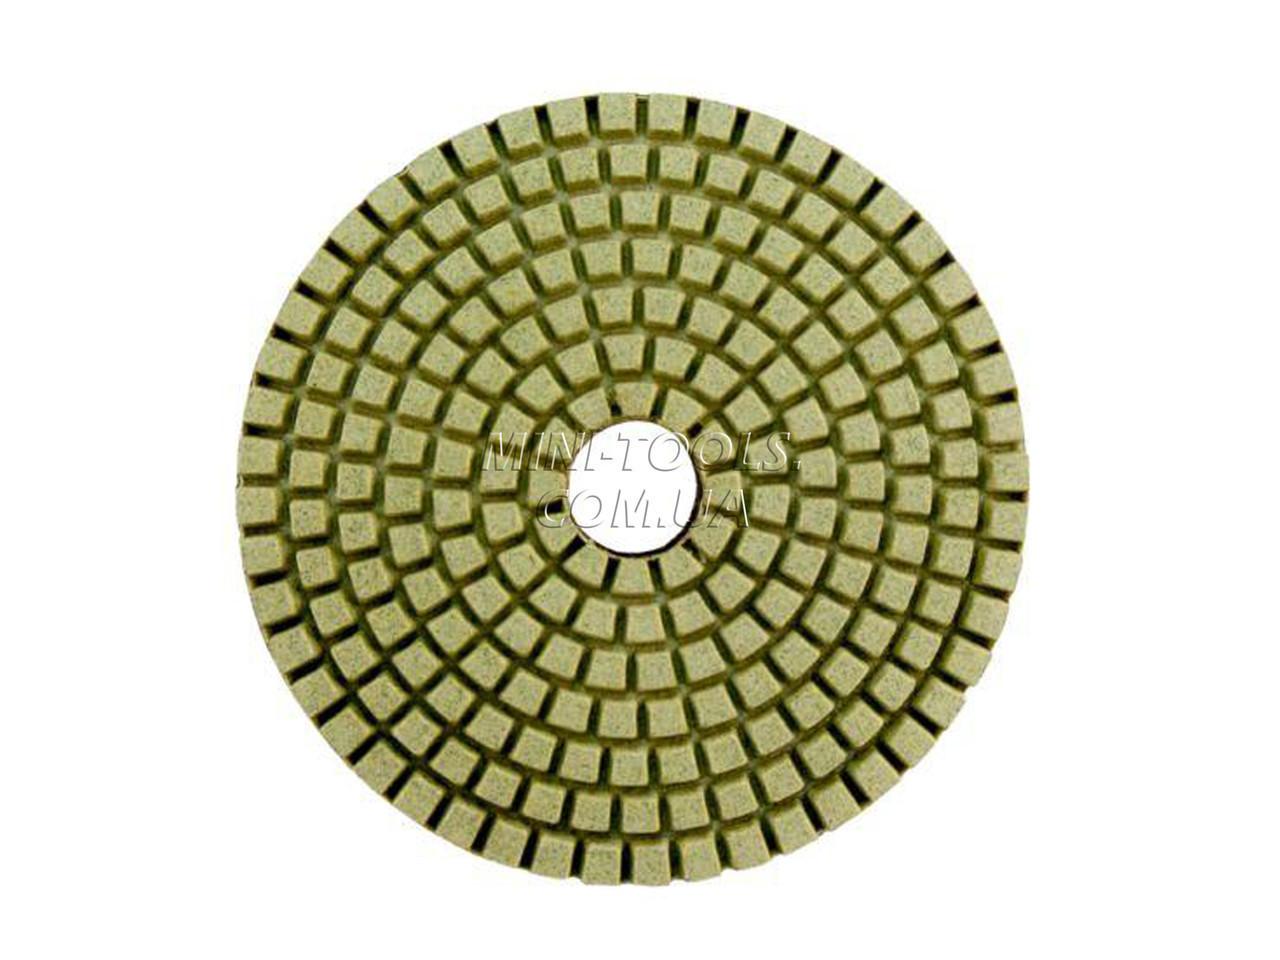 Черепашка D-100мм. зерно #150. Алмазний гнучкий шліфувальний круг YDS Tools